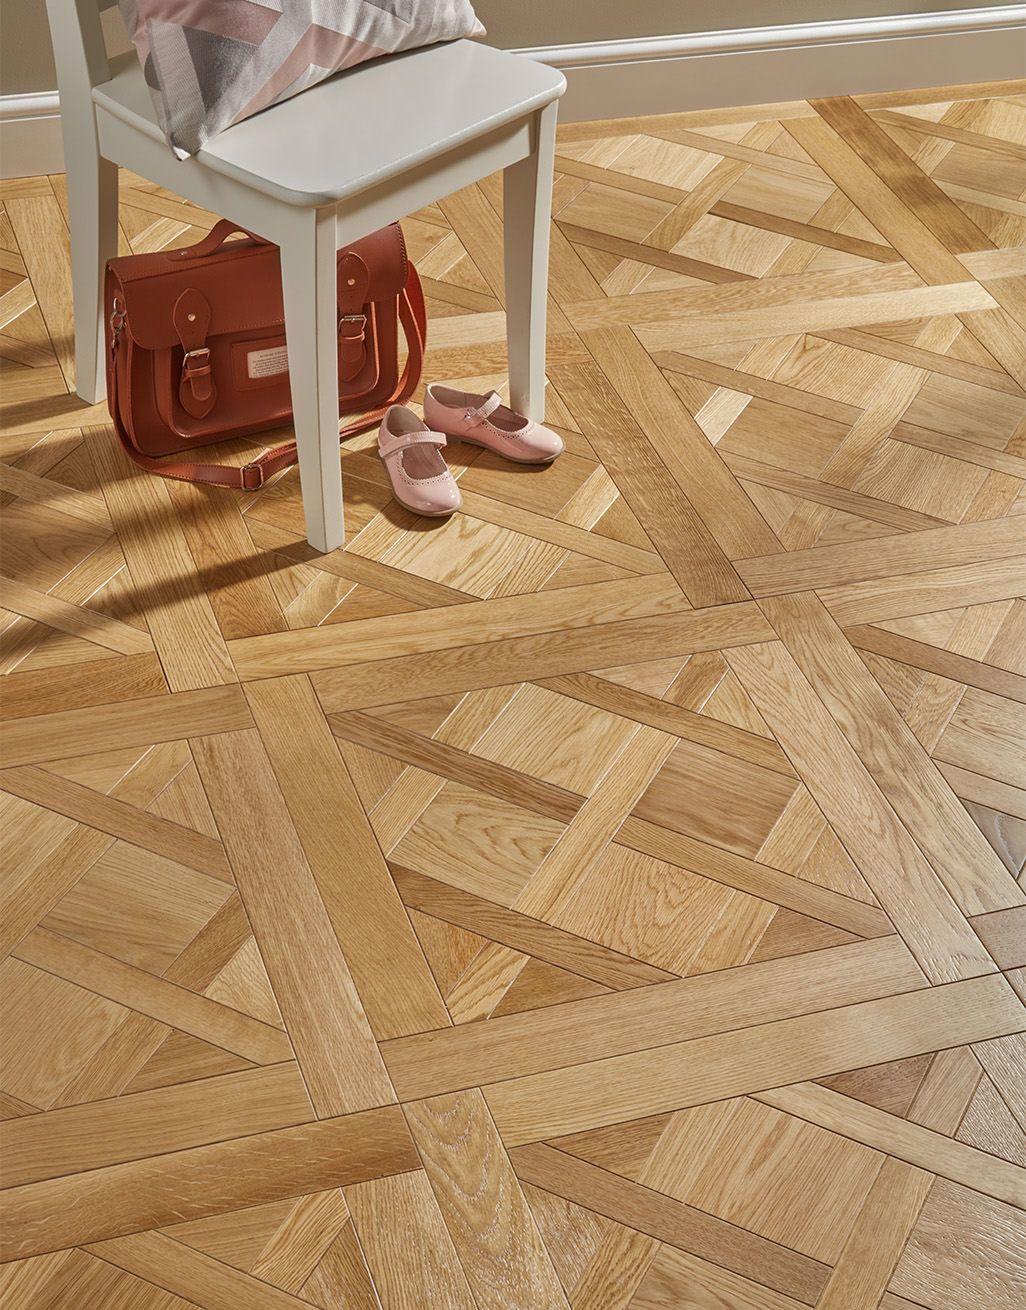 Avignon Natural Oak Brushed Oiled Versailles Tile Engineered Wood Flooring Direct Wood Flooring